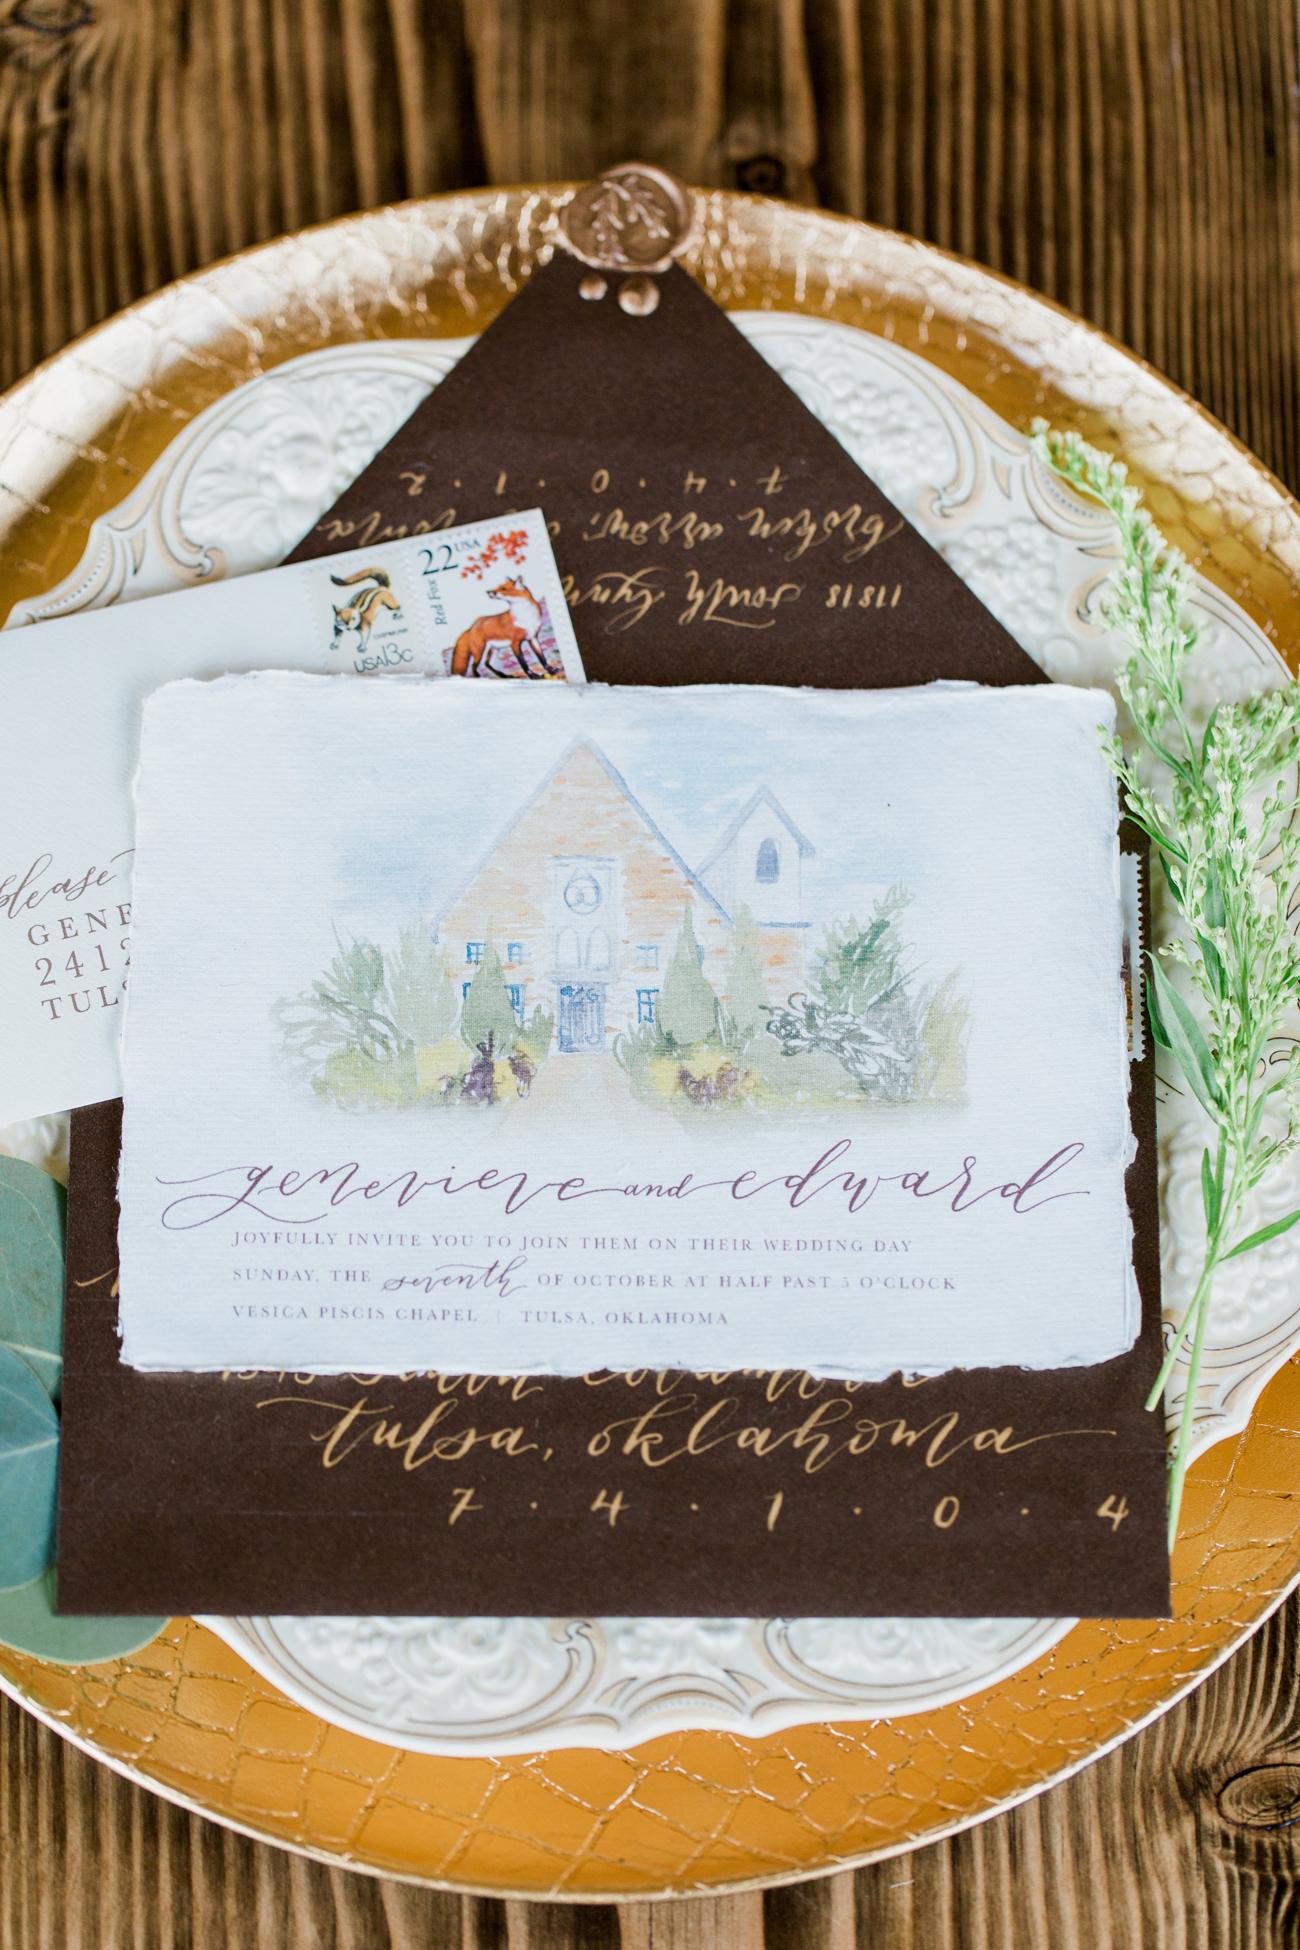 vesica-piscis-tulsa-wedding-la-vintage-rentals-12.jpg